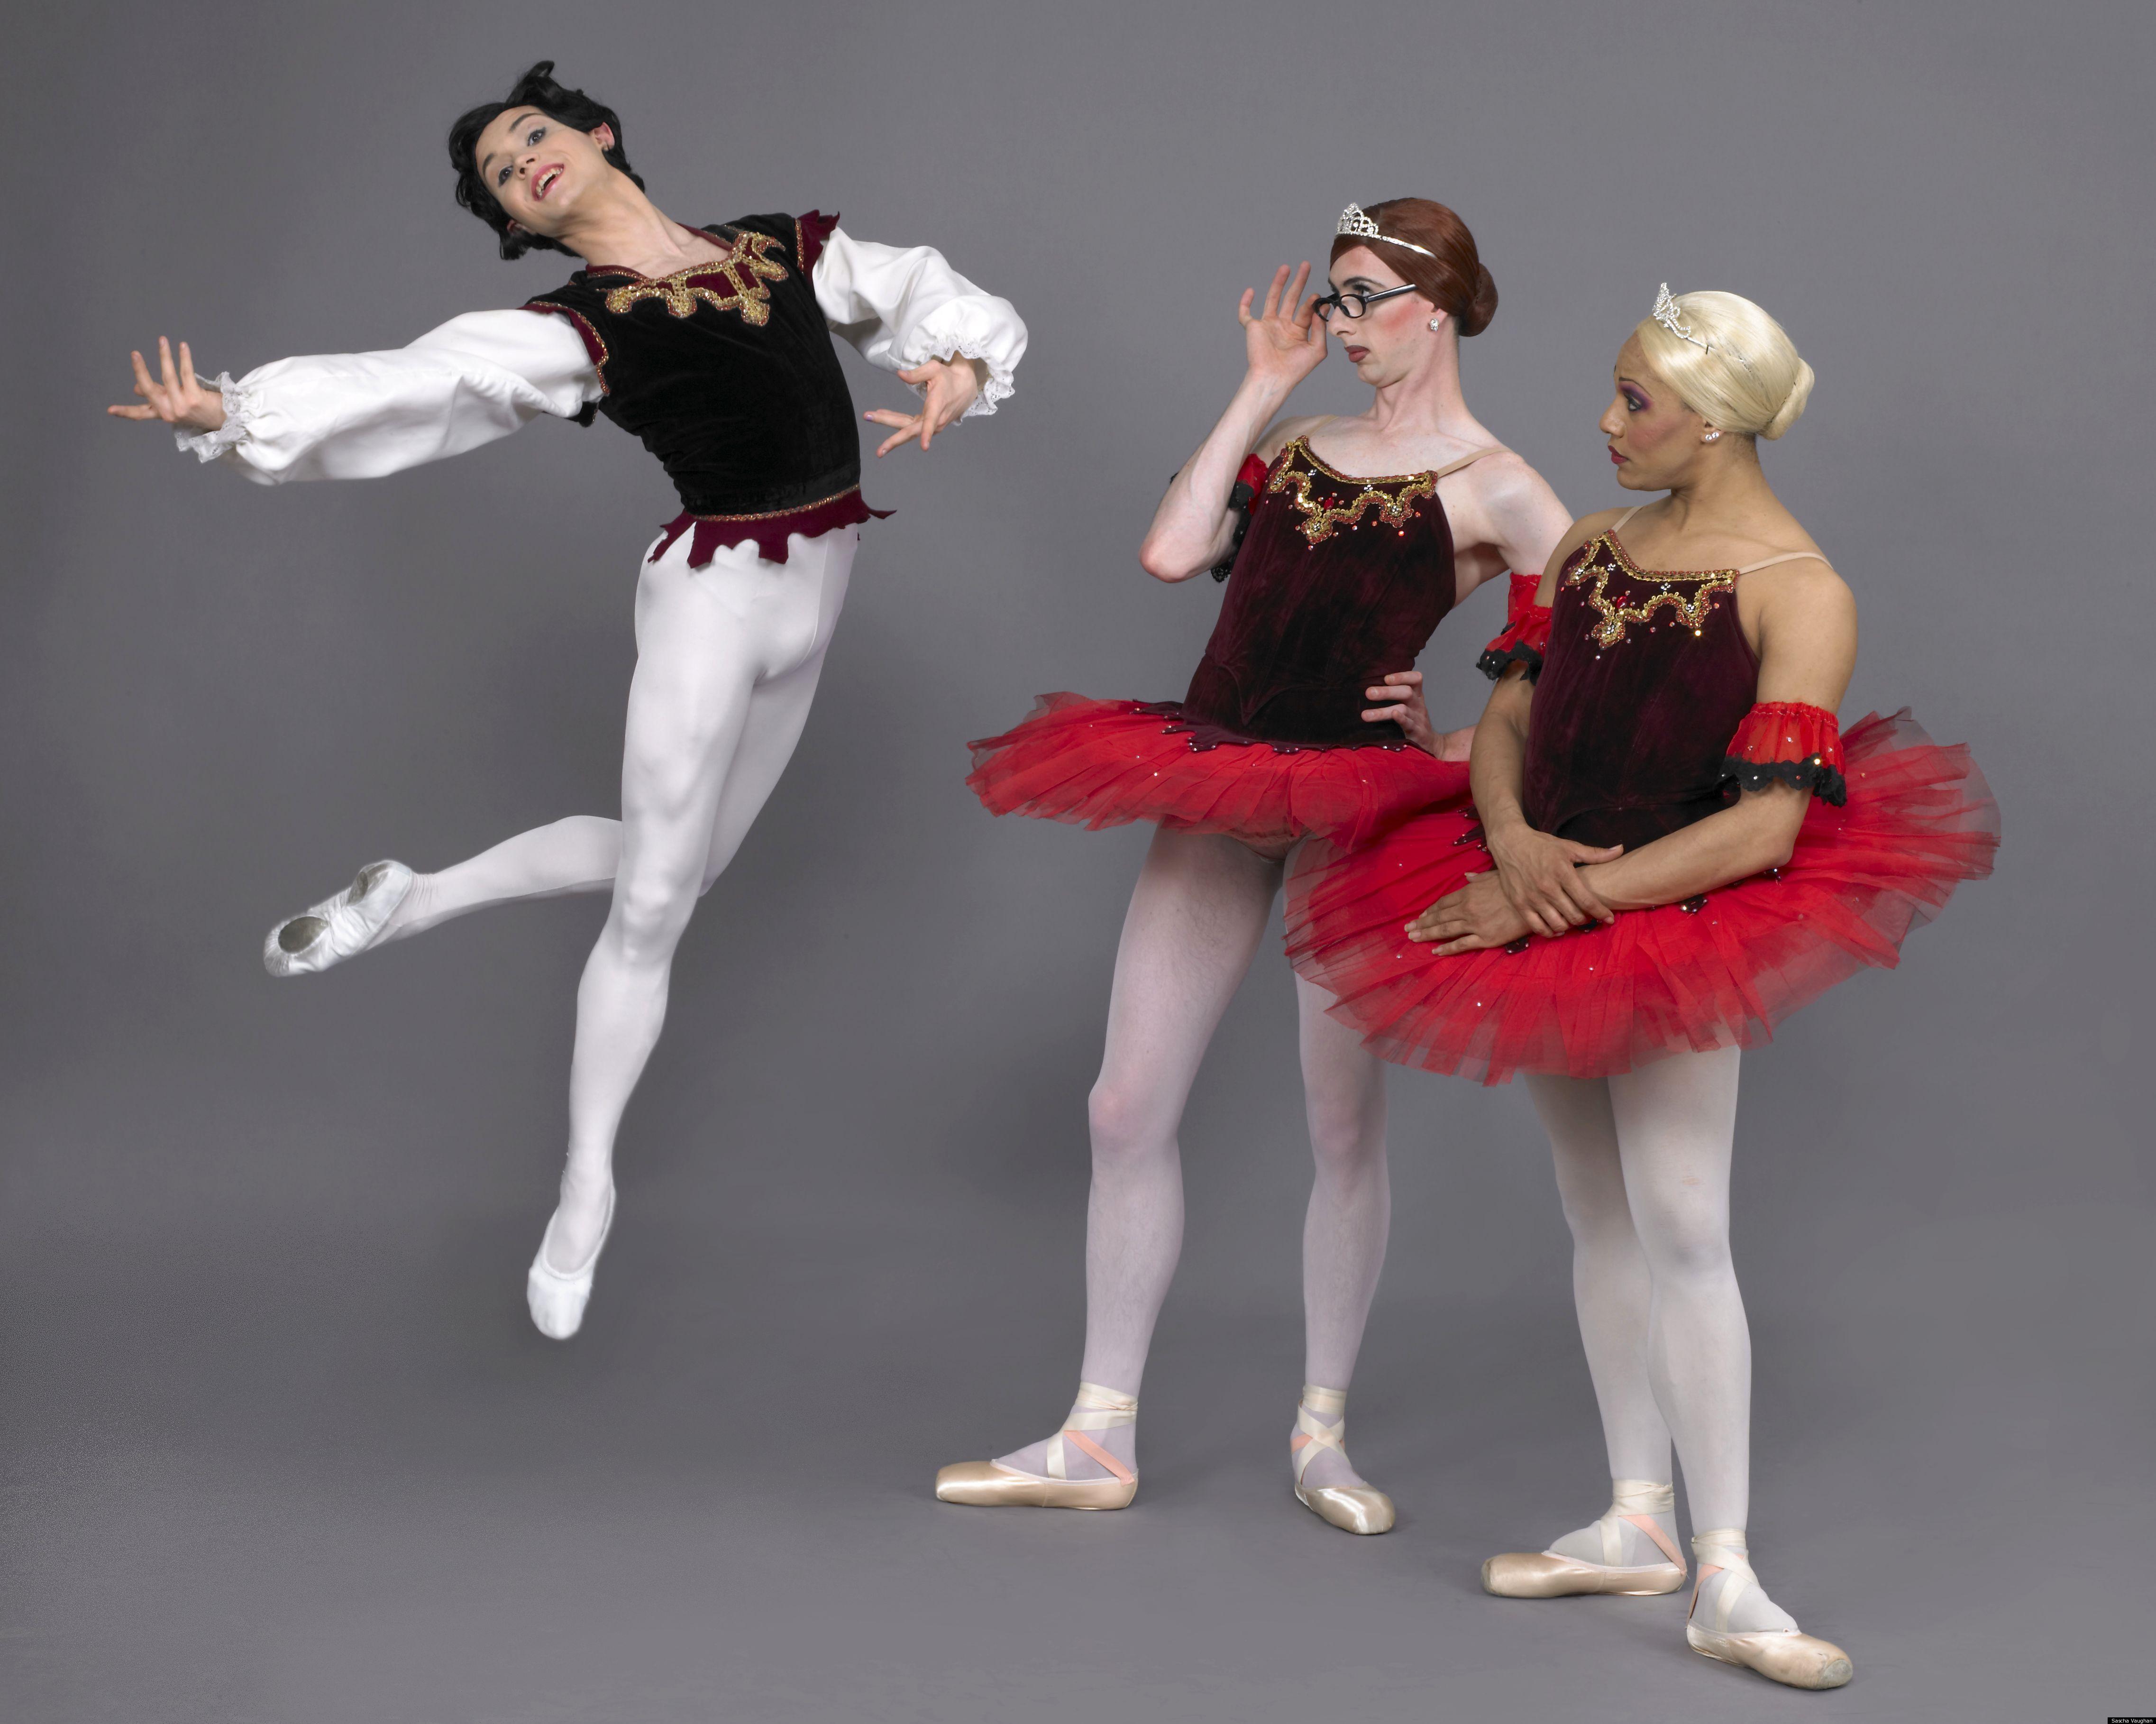 Uncategorized Funny Ballet huffpost arts interviews robert carter of les ballets trockadero de monte carlo photos video